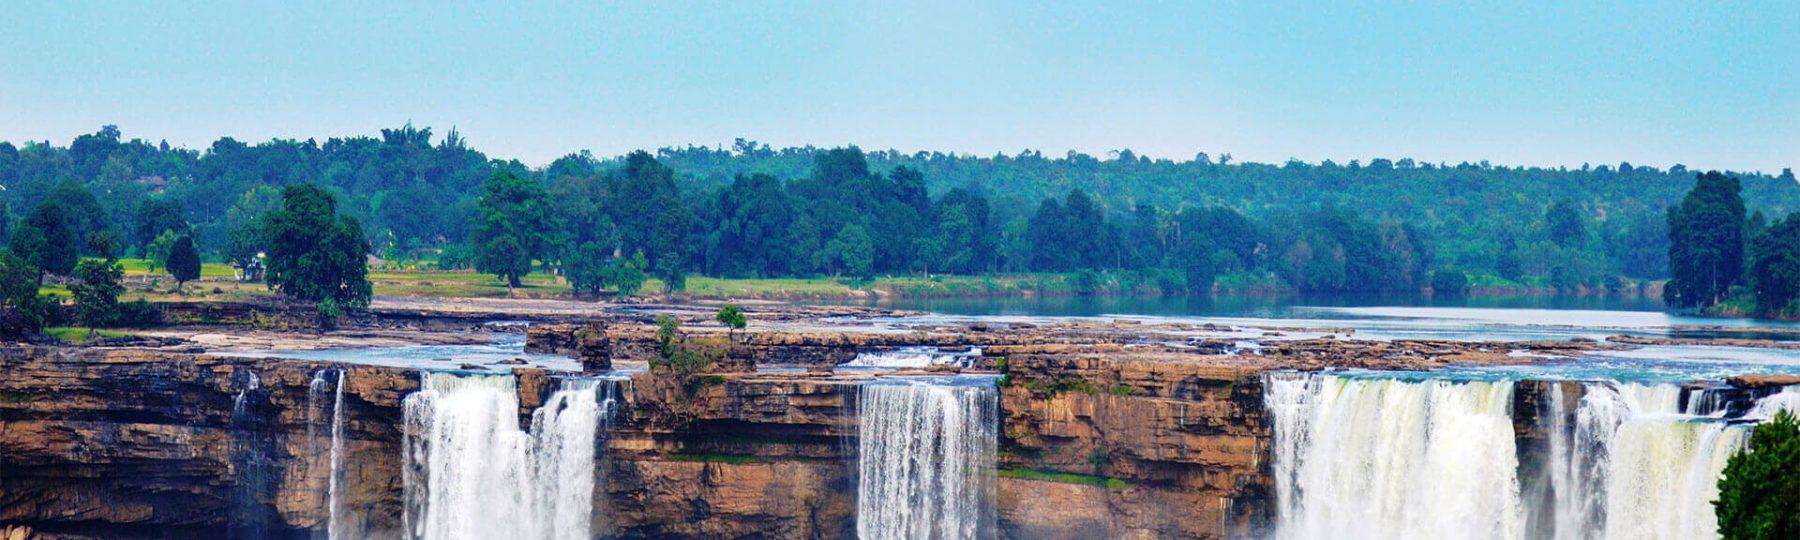 Chitrakot Waterfall